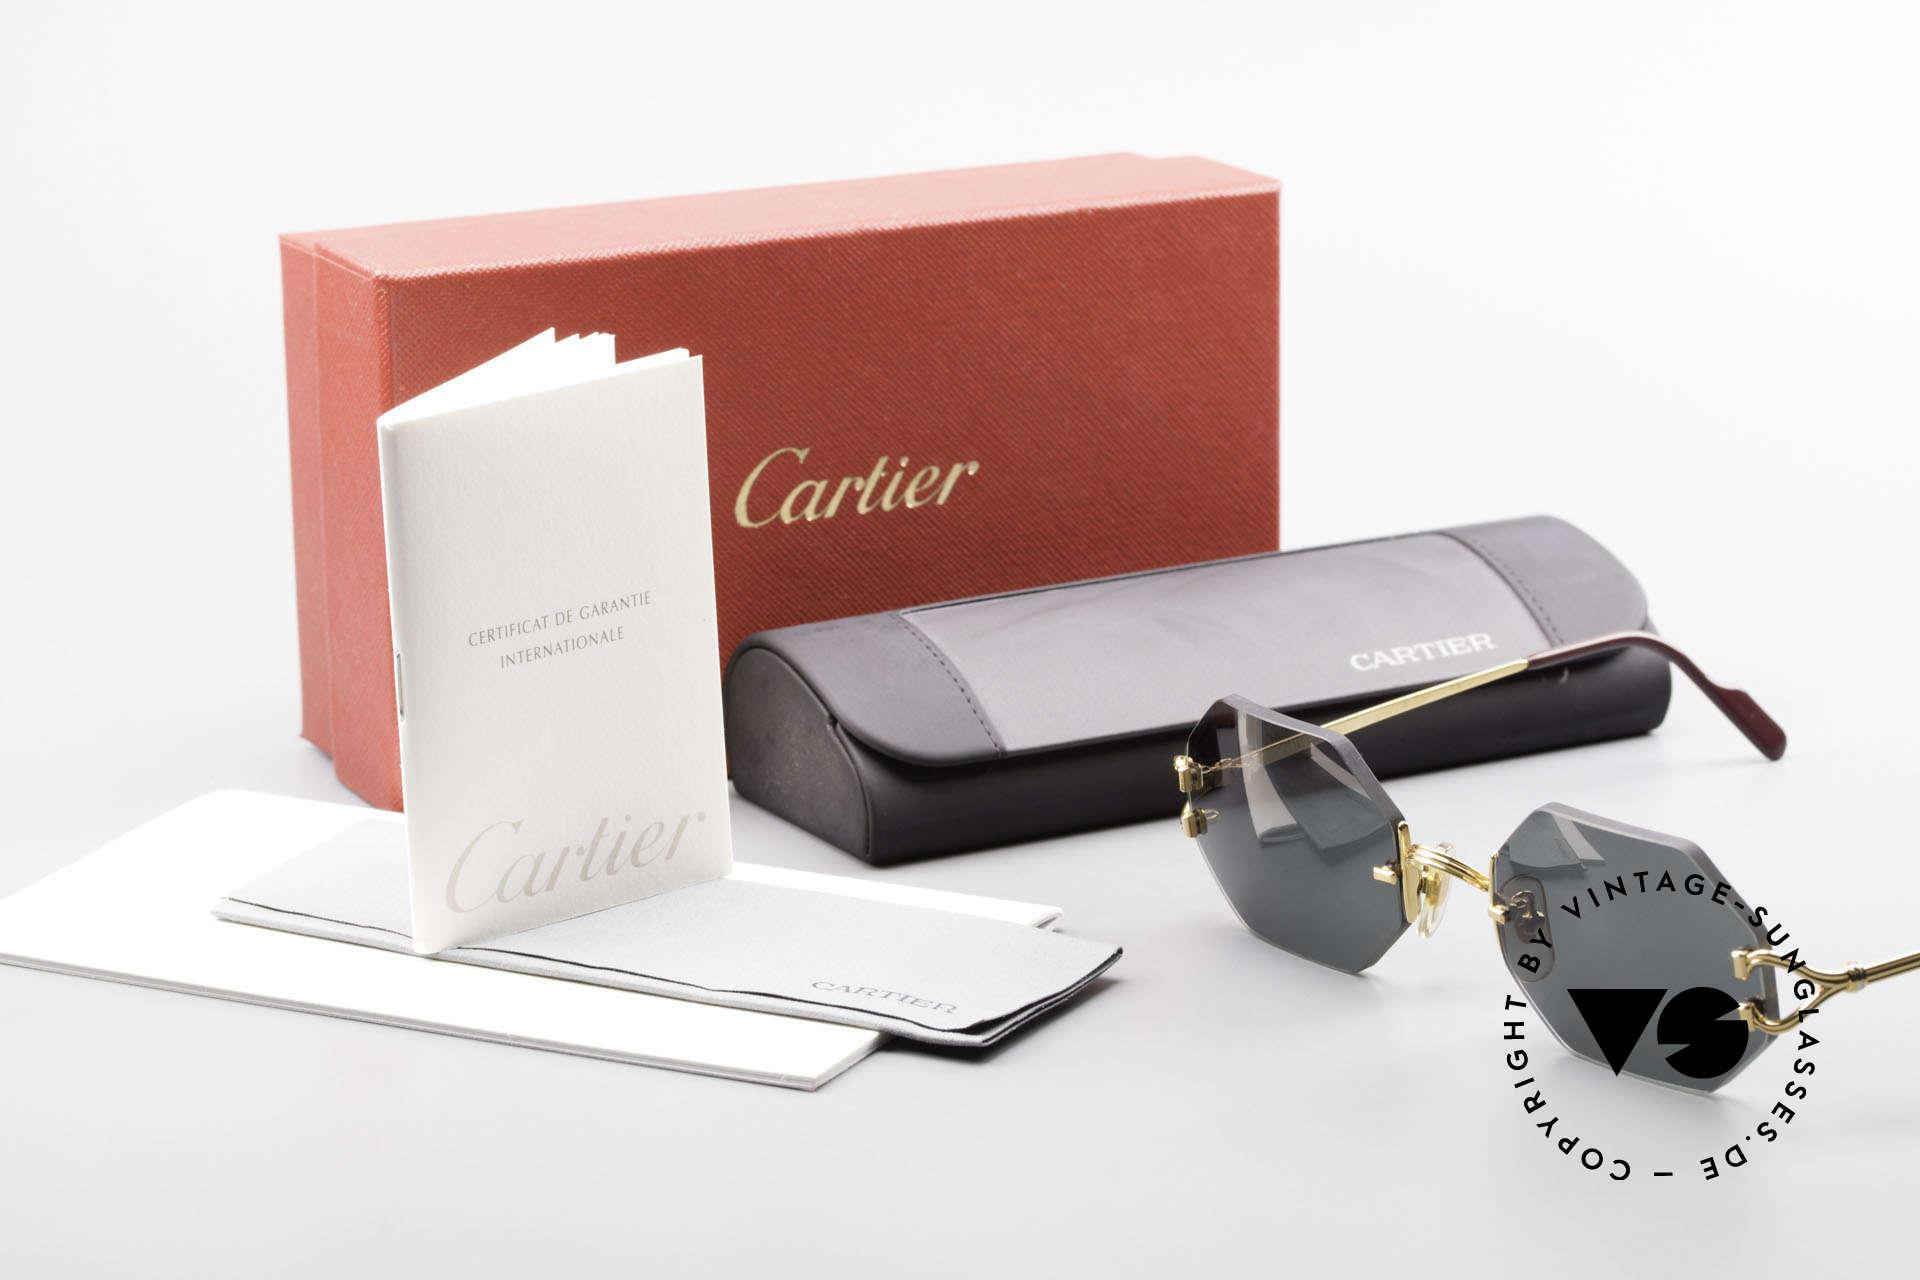 Cartier Rimless Octag Rimless Octagonal Shades - L, NO RETRO, but a RARE old ORIGINAL, one of a kind!, Made for Men and Women